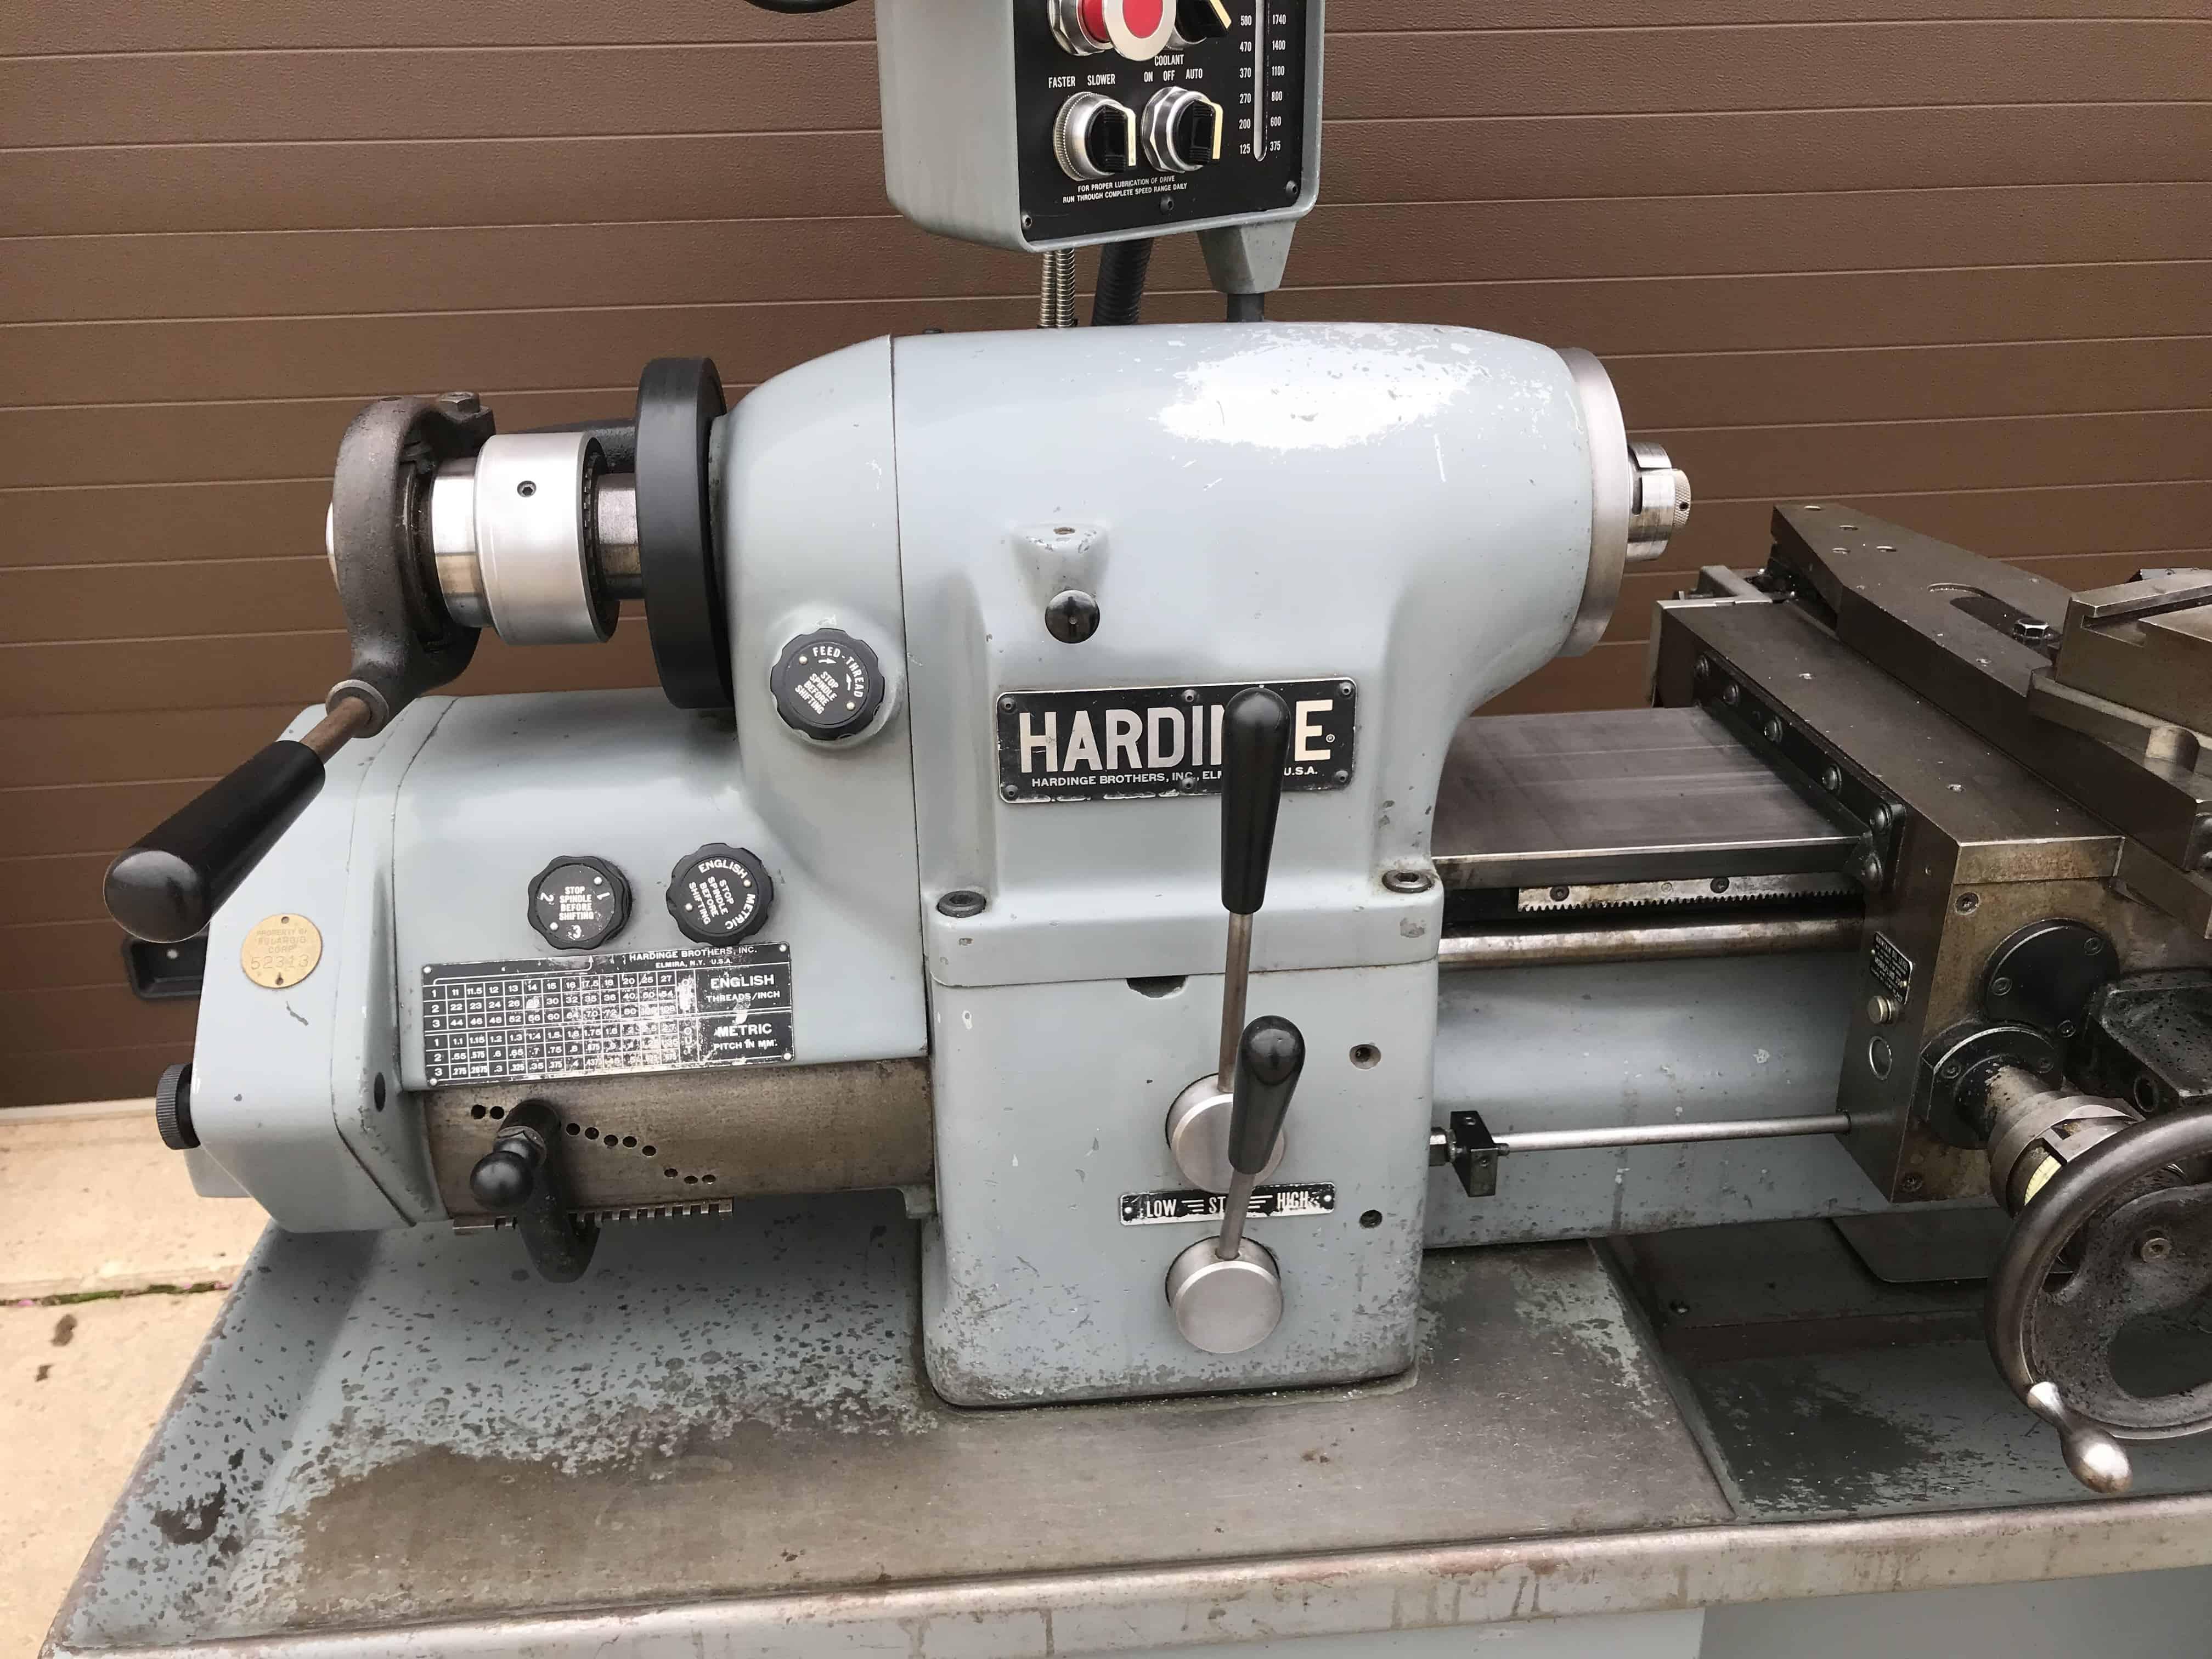 Hardinge Hlv-h-em Tool Room Lathe